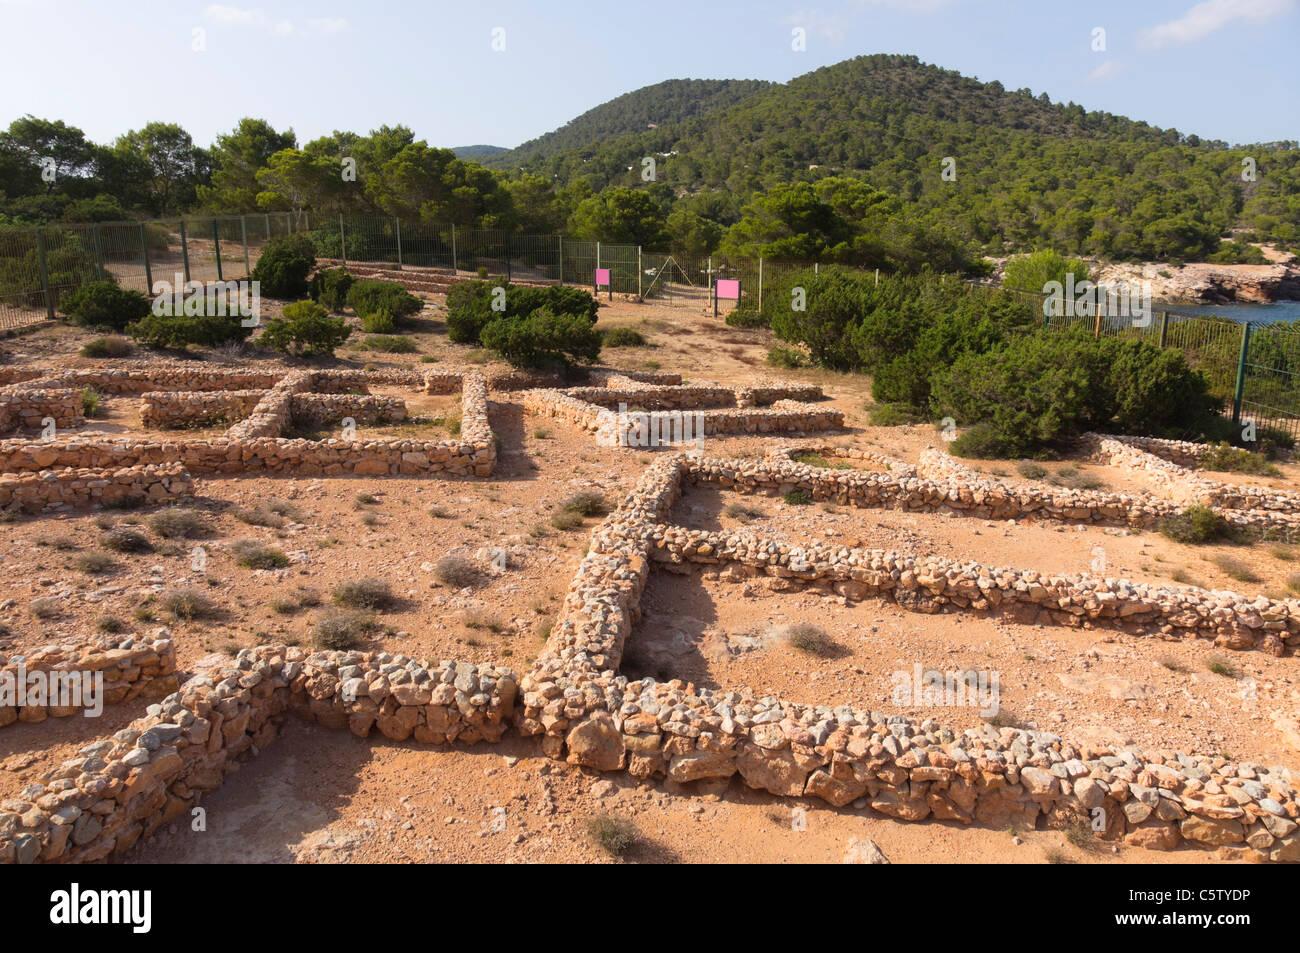 Ibiza, Balearics, Spain - Sa Caleta, Punic settlement archaeological site. Poblat fenici, Phoenician pueblo village - Stock Image